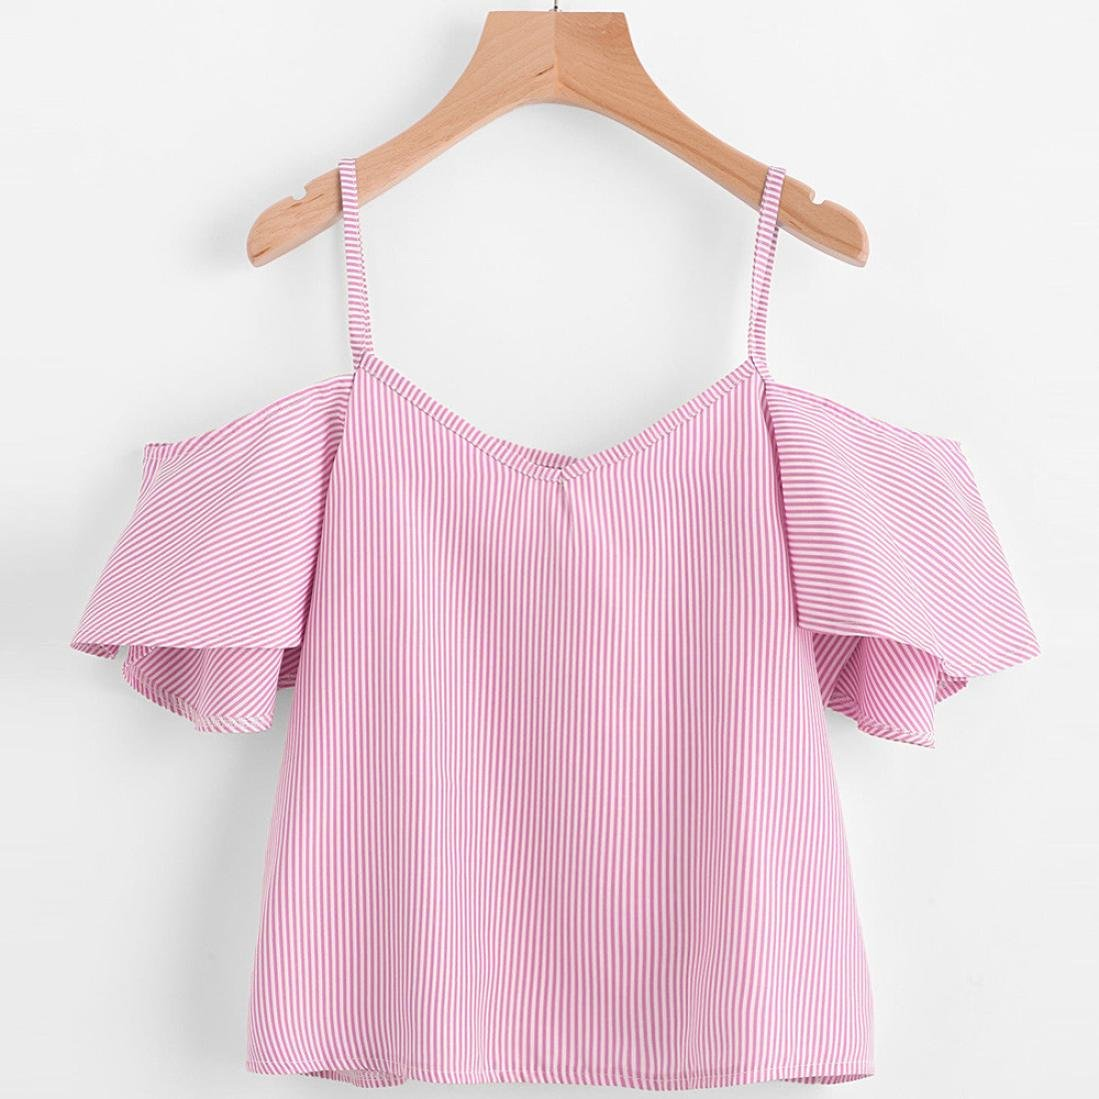 Camisetas mujer,❤️Ba Zha Hei Tops de rayas de mujer Shirt Crop Tops Chaleco para mujer blusa camiseta sin mangas Tank Tops Mujeres Blusas Deportes ...